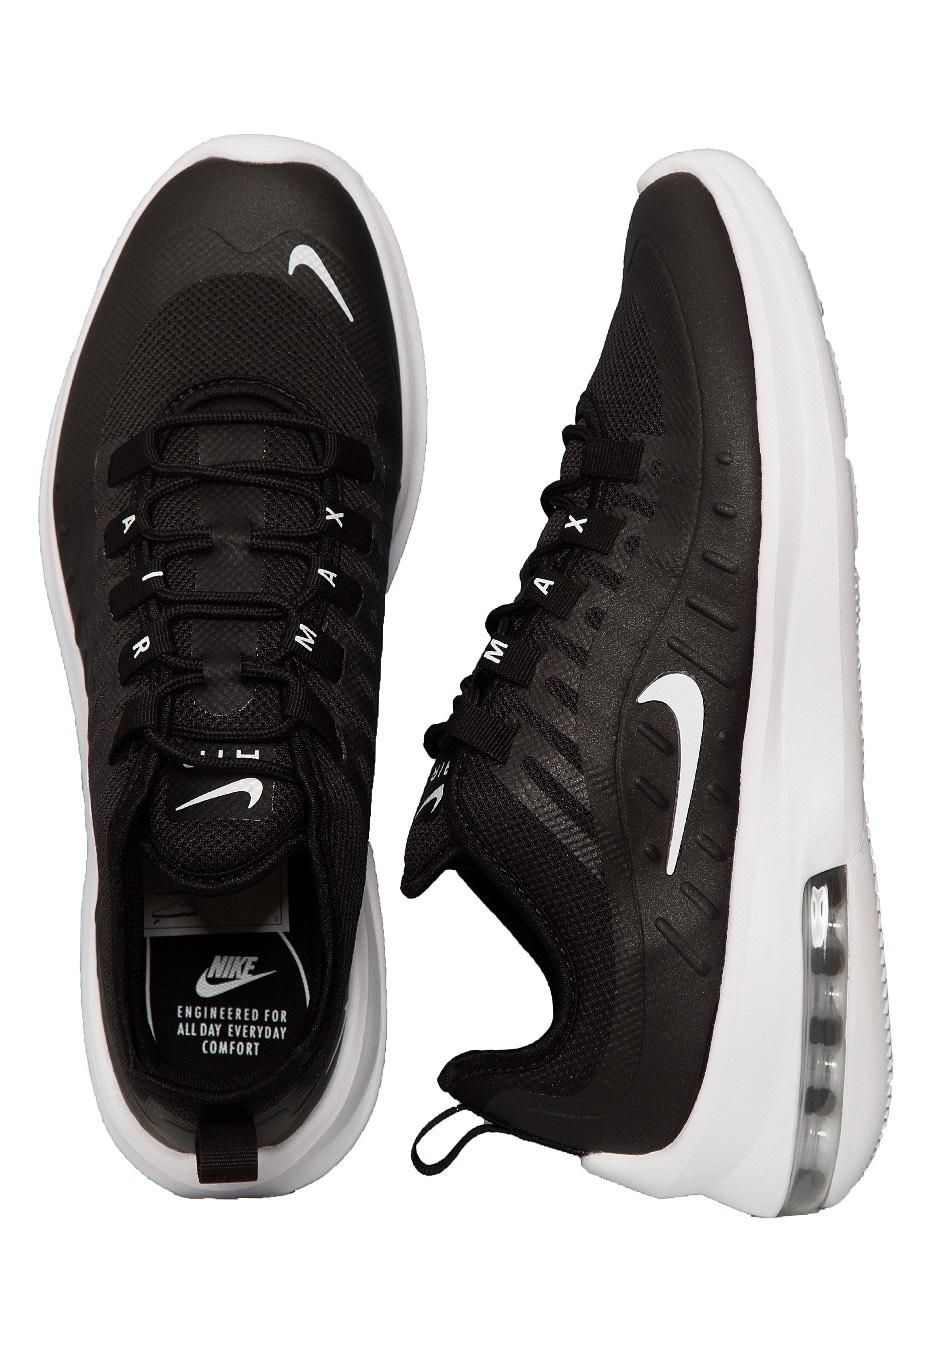 9b9f95d3679c Nike - Air Max Axis Black White - Shoes - Impericon.com UK